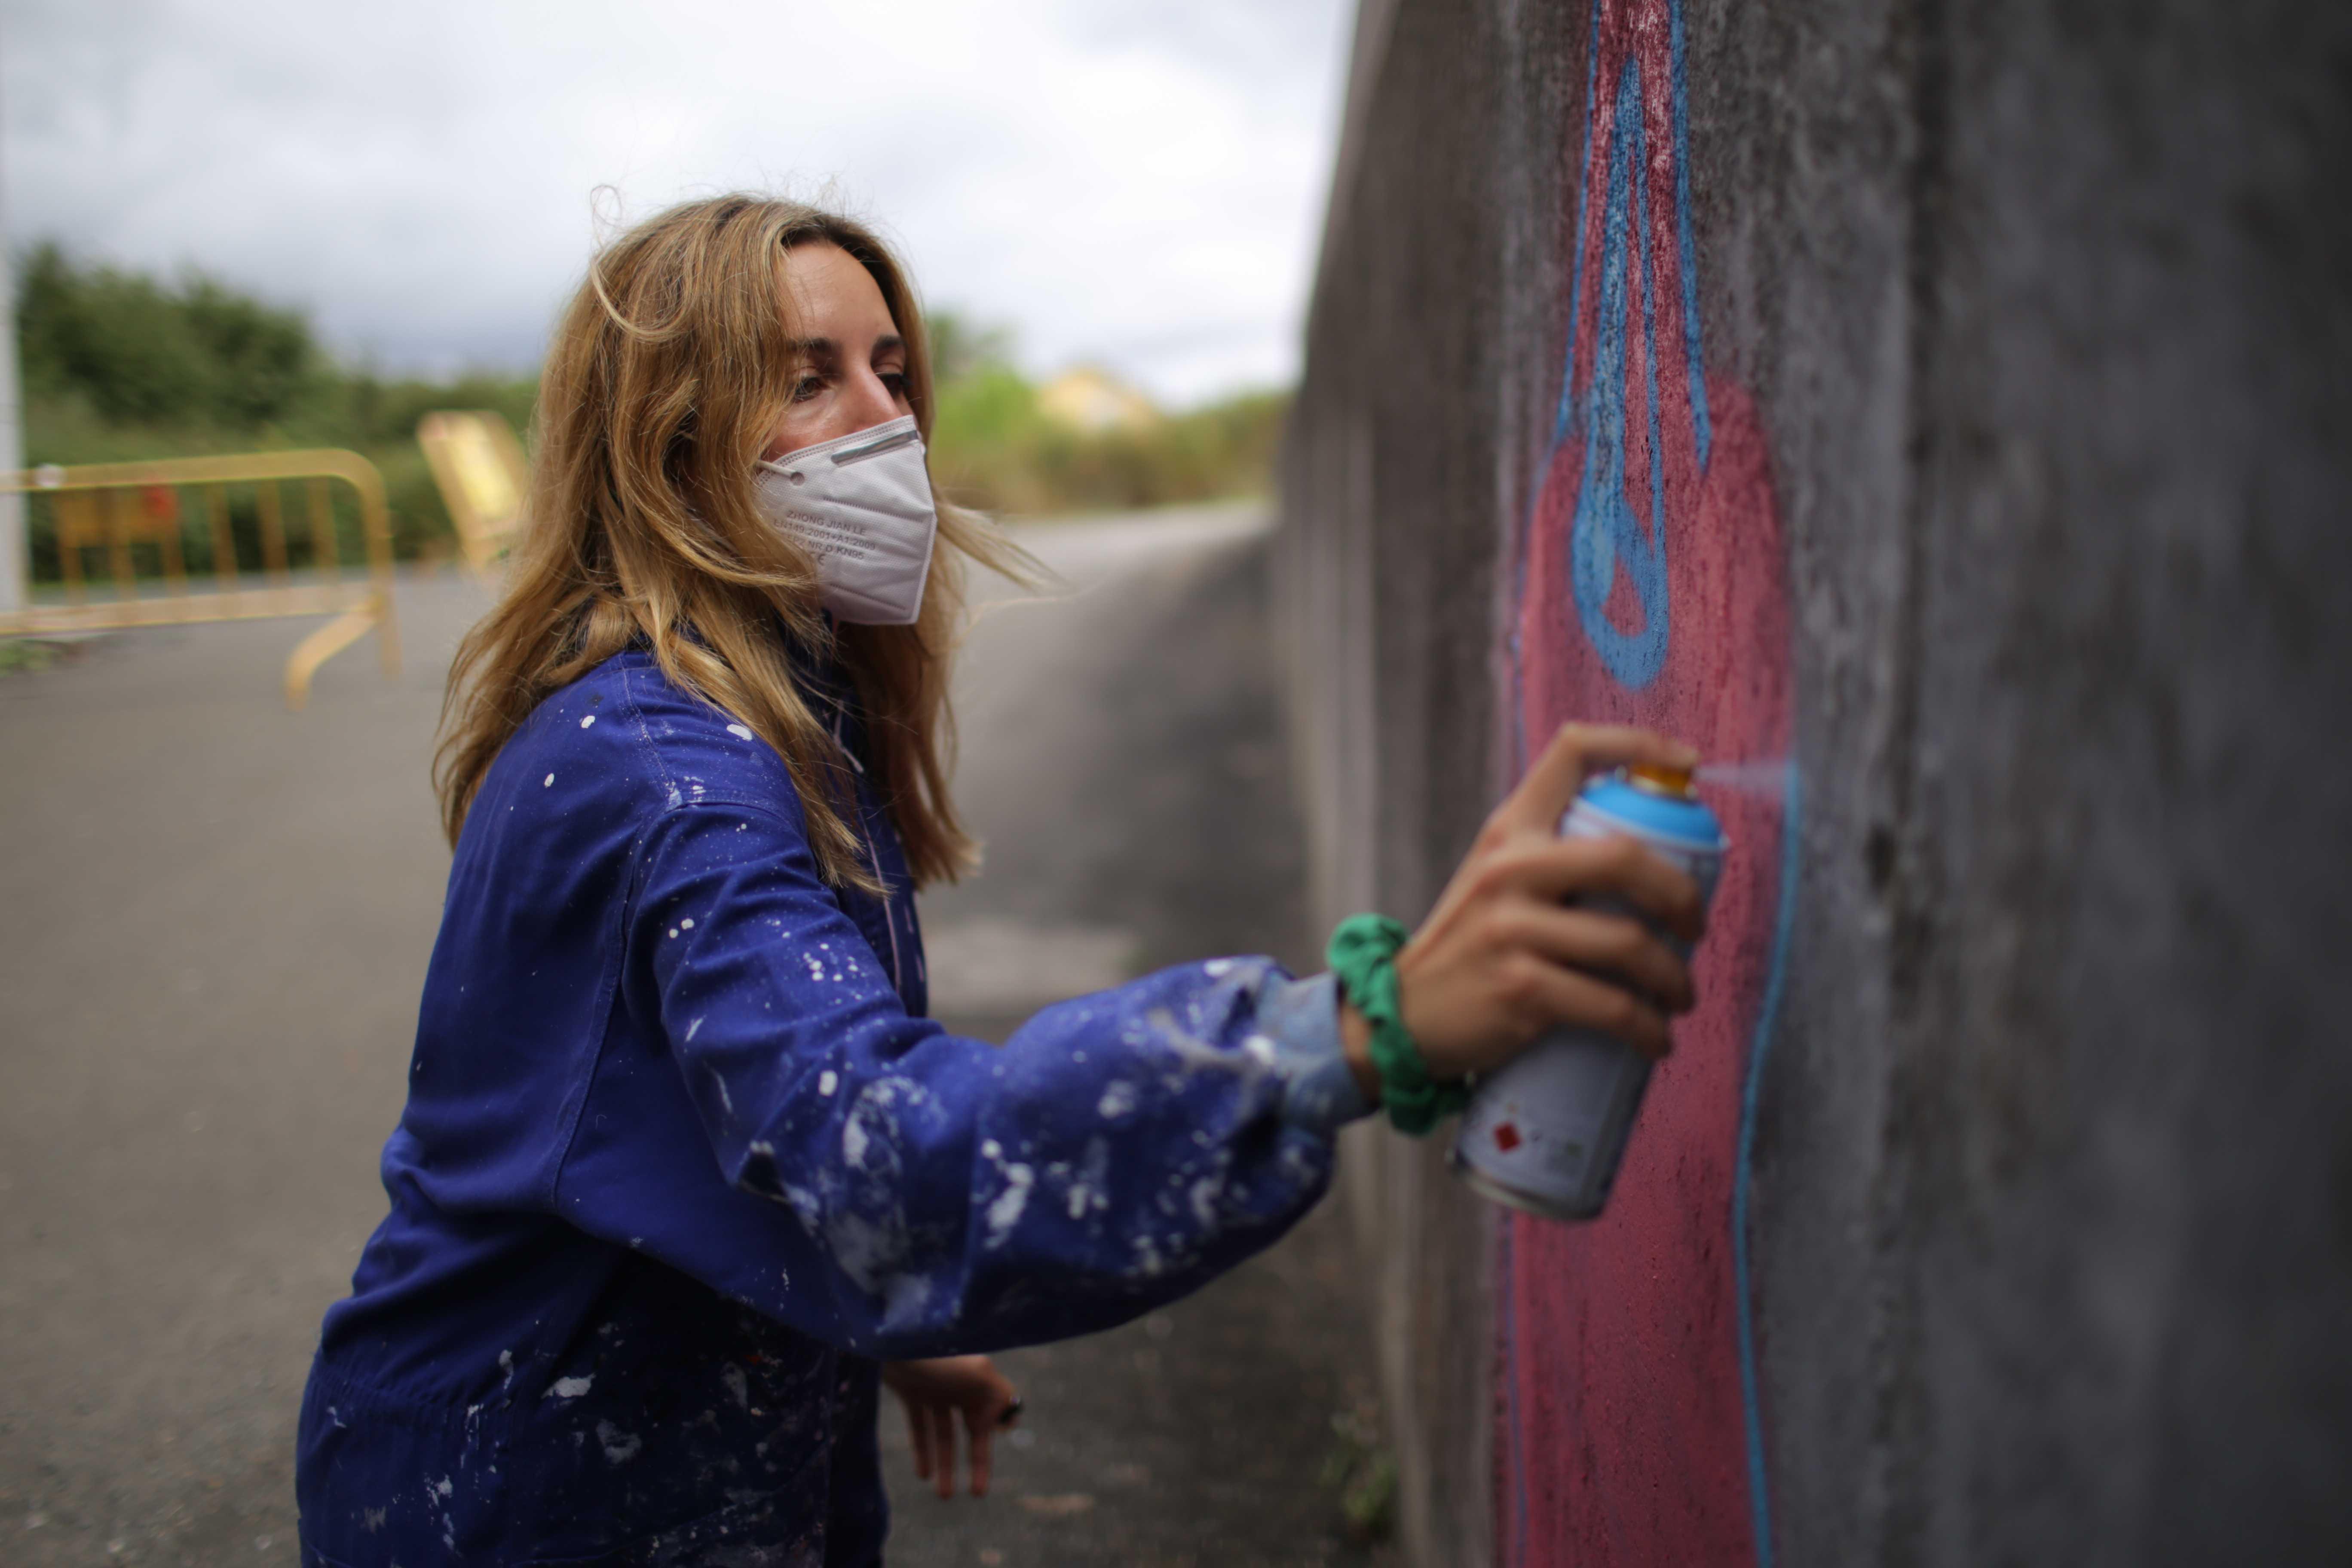 Lupita Hard no obradoiro 'Graffiti e protesta social' que impartiu no Delas Fest 2020